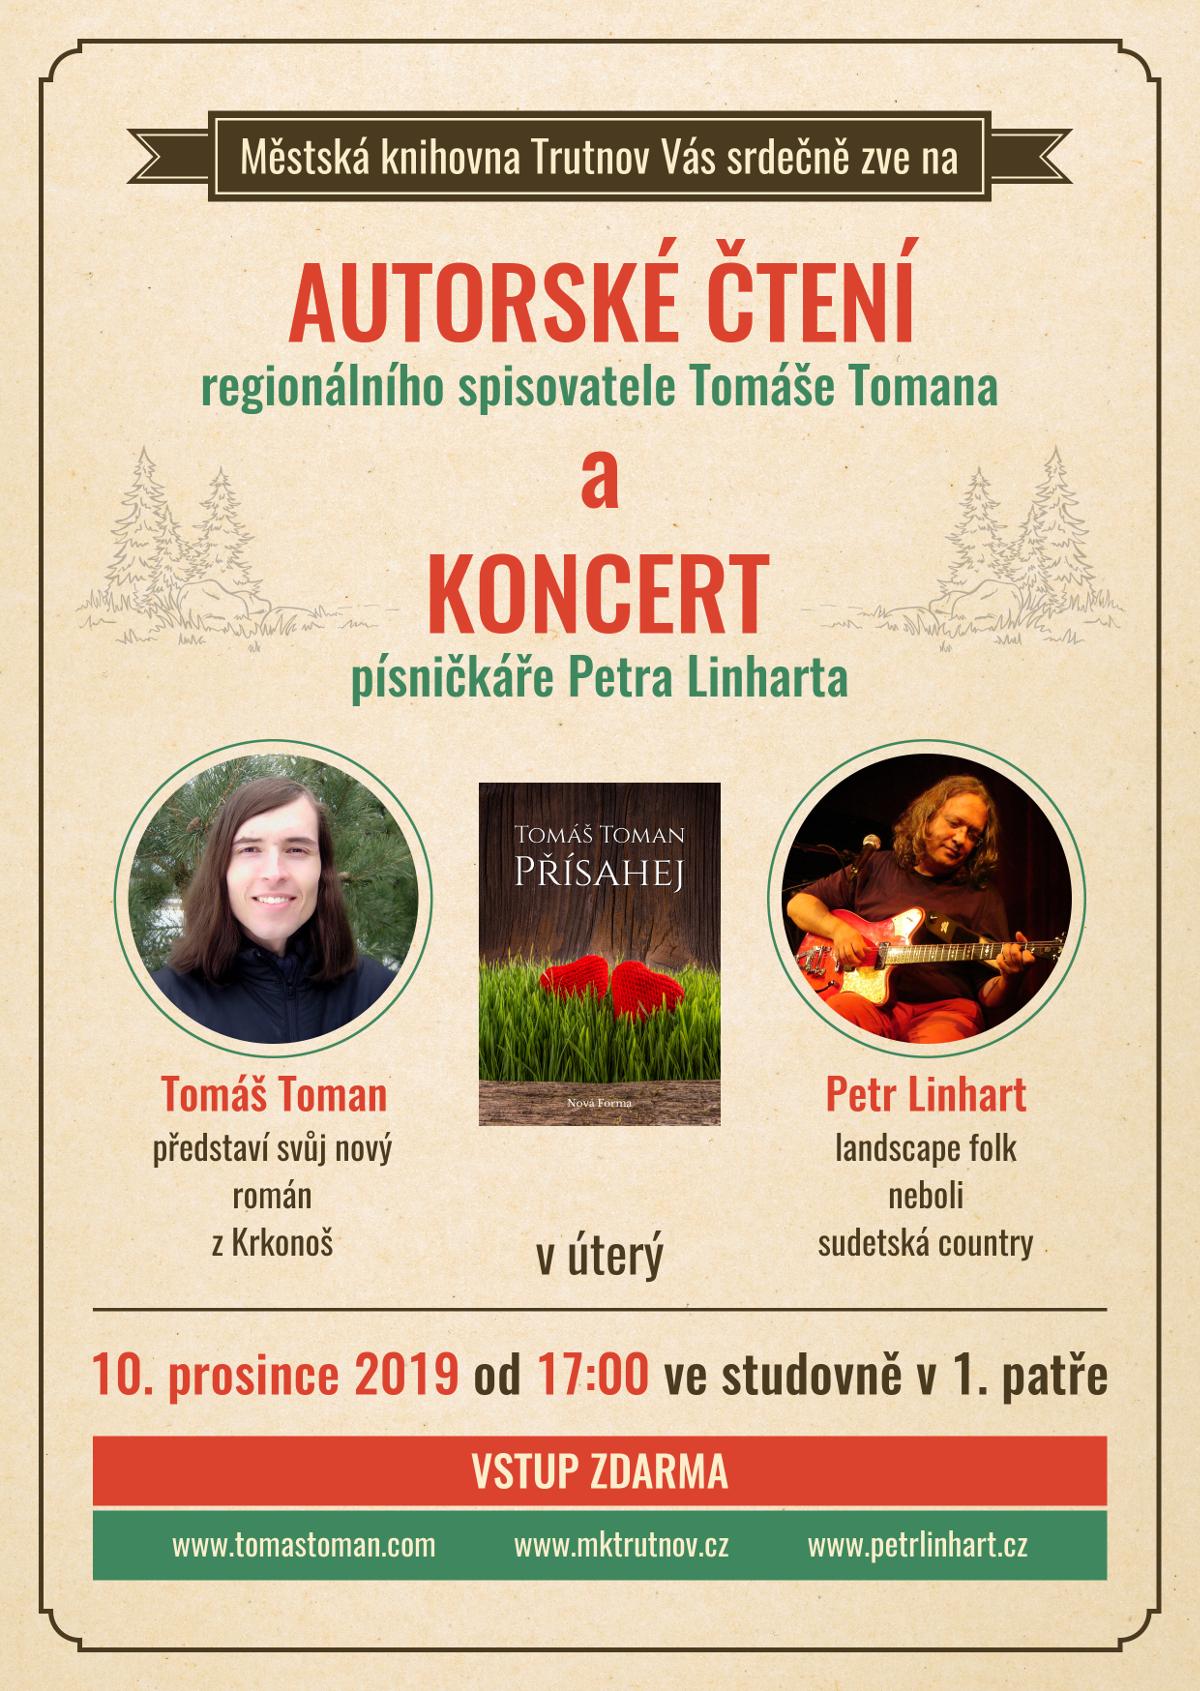 Autorské čtení Tomáše Tomana a koncert Petra Linharta